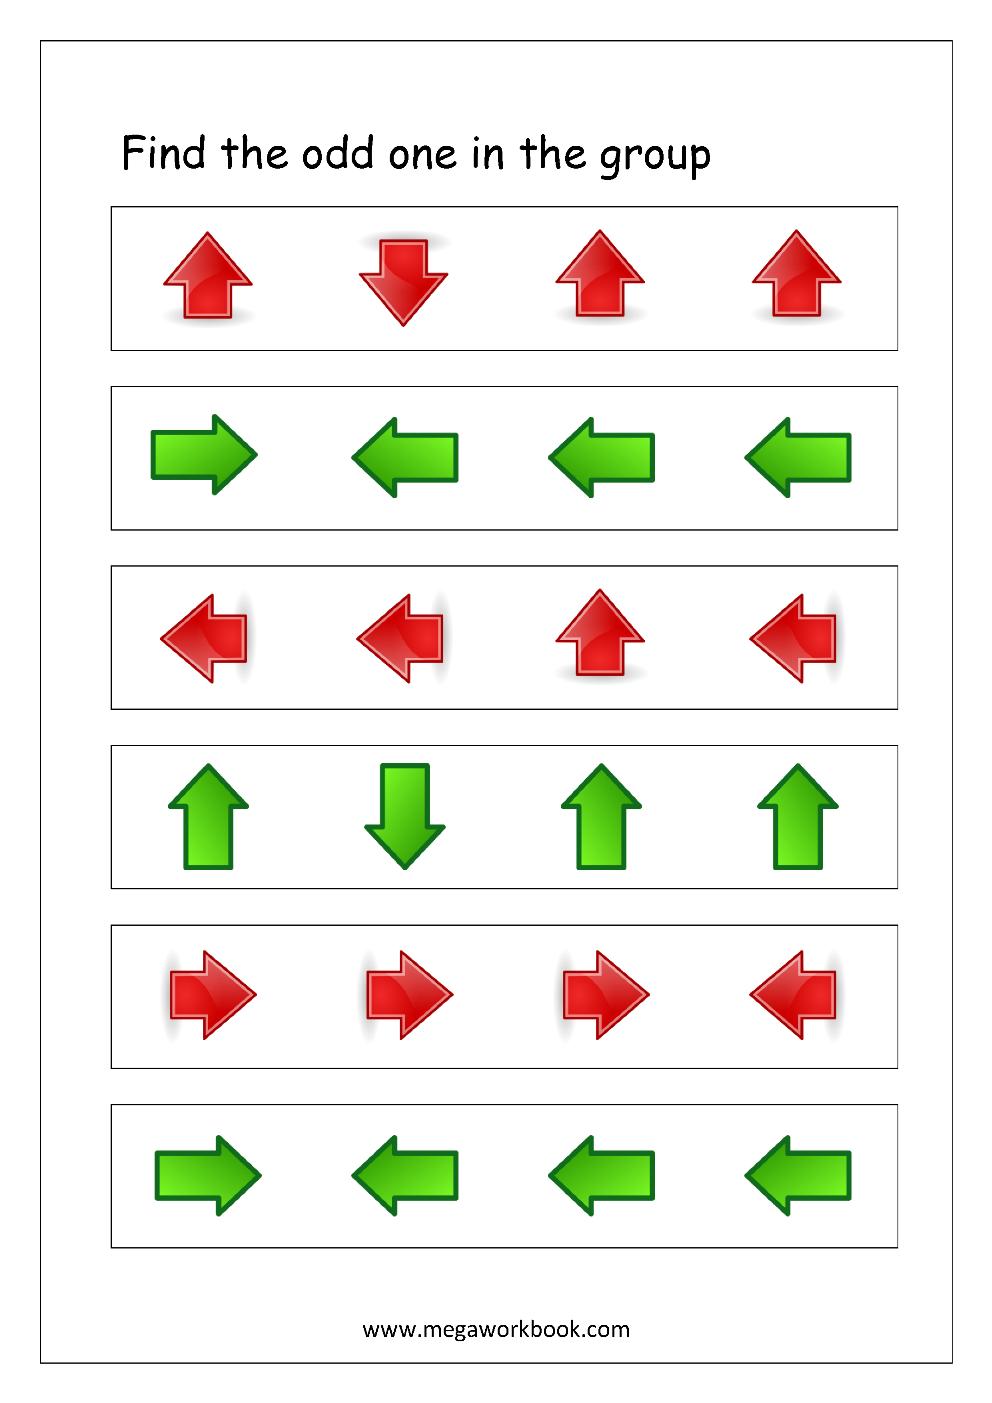 Odd And Even Numbers further Original besides Number Coloring Worksheets For Preschool Children additionally Coloring Sheet Notebook Eraser Sharpener Pencil furthermore Original. on number identification worksheets